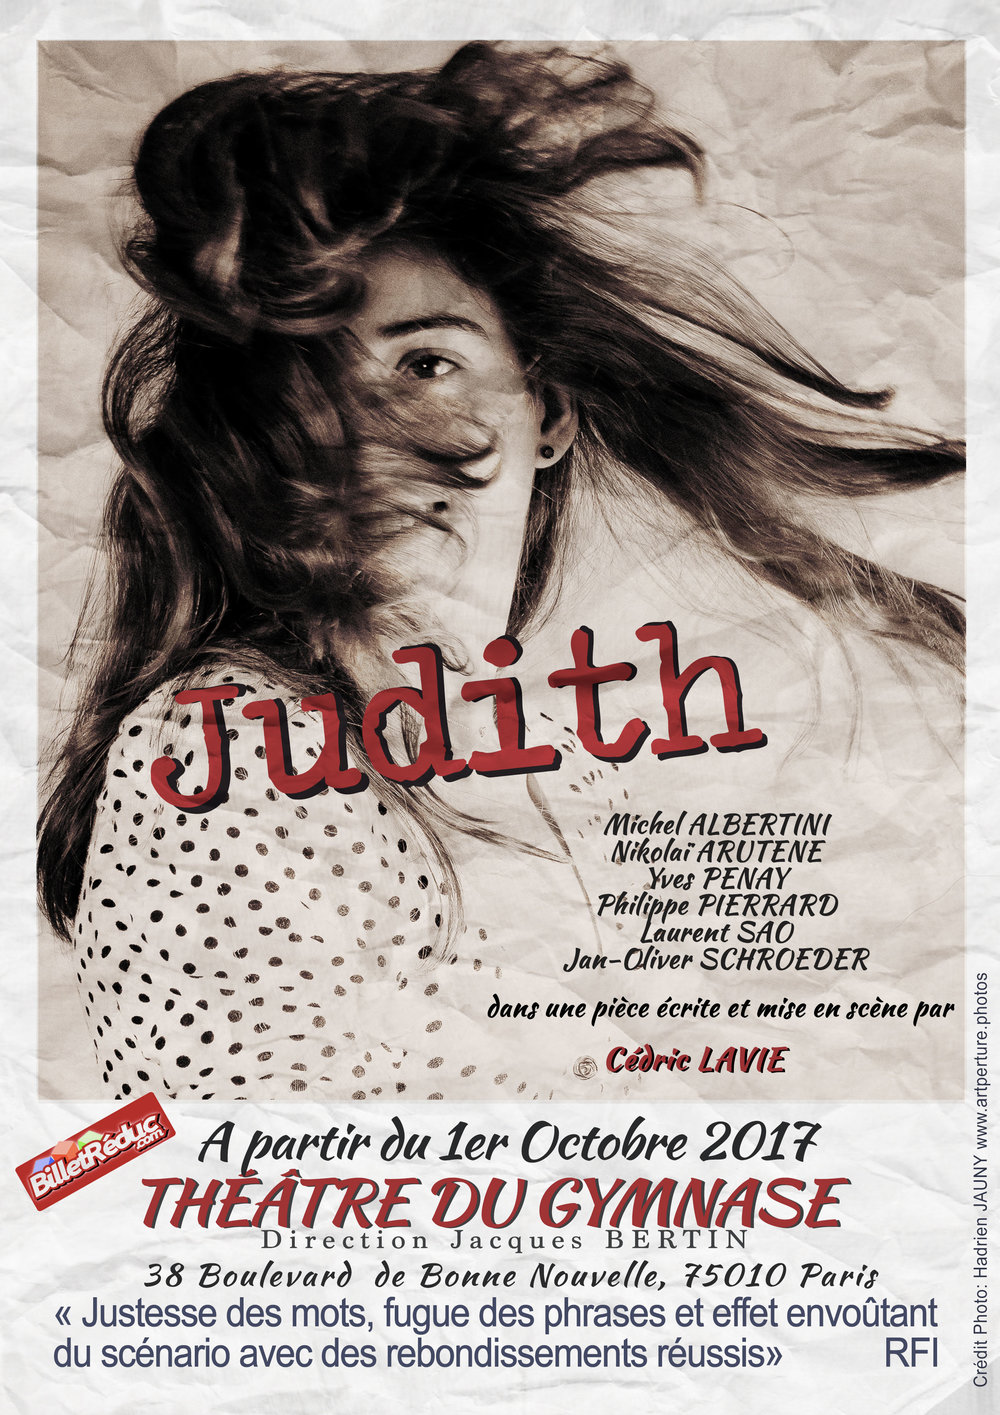 Judith-Affiche-Th-dy-Gymnase-Sept-17.jpg